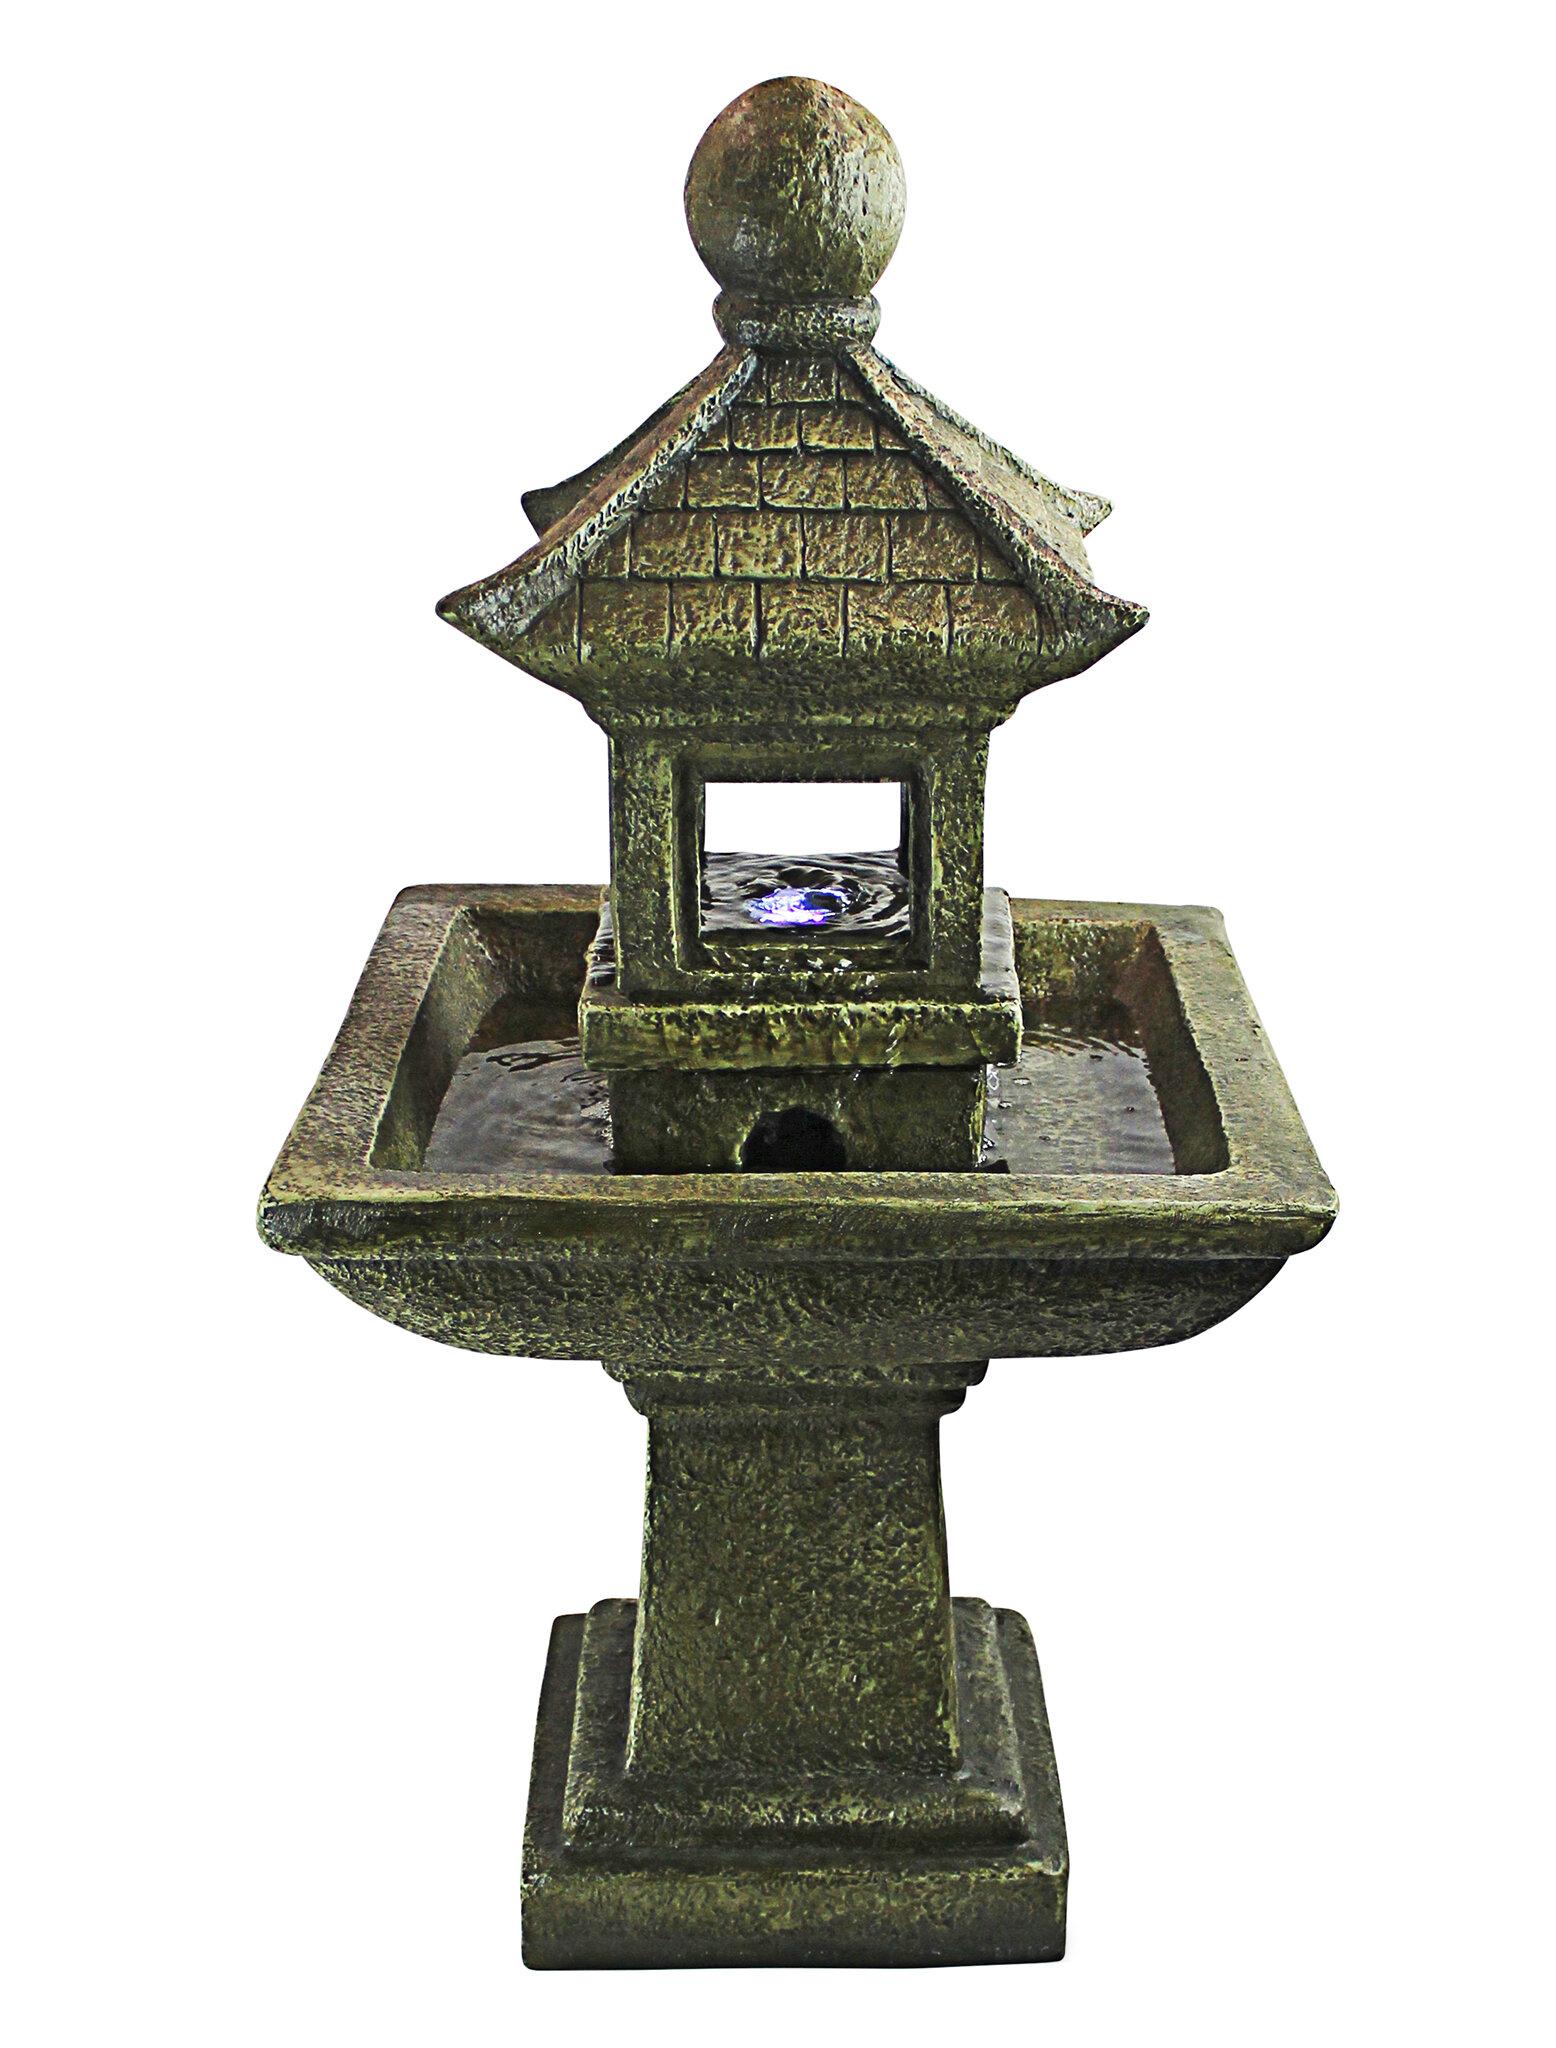 Design Toscano Resin Sacred Space Pagoda Illuminated Garden